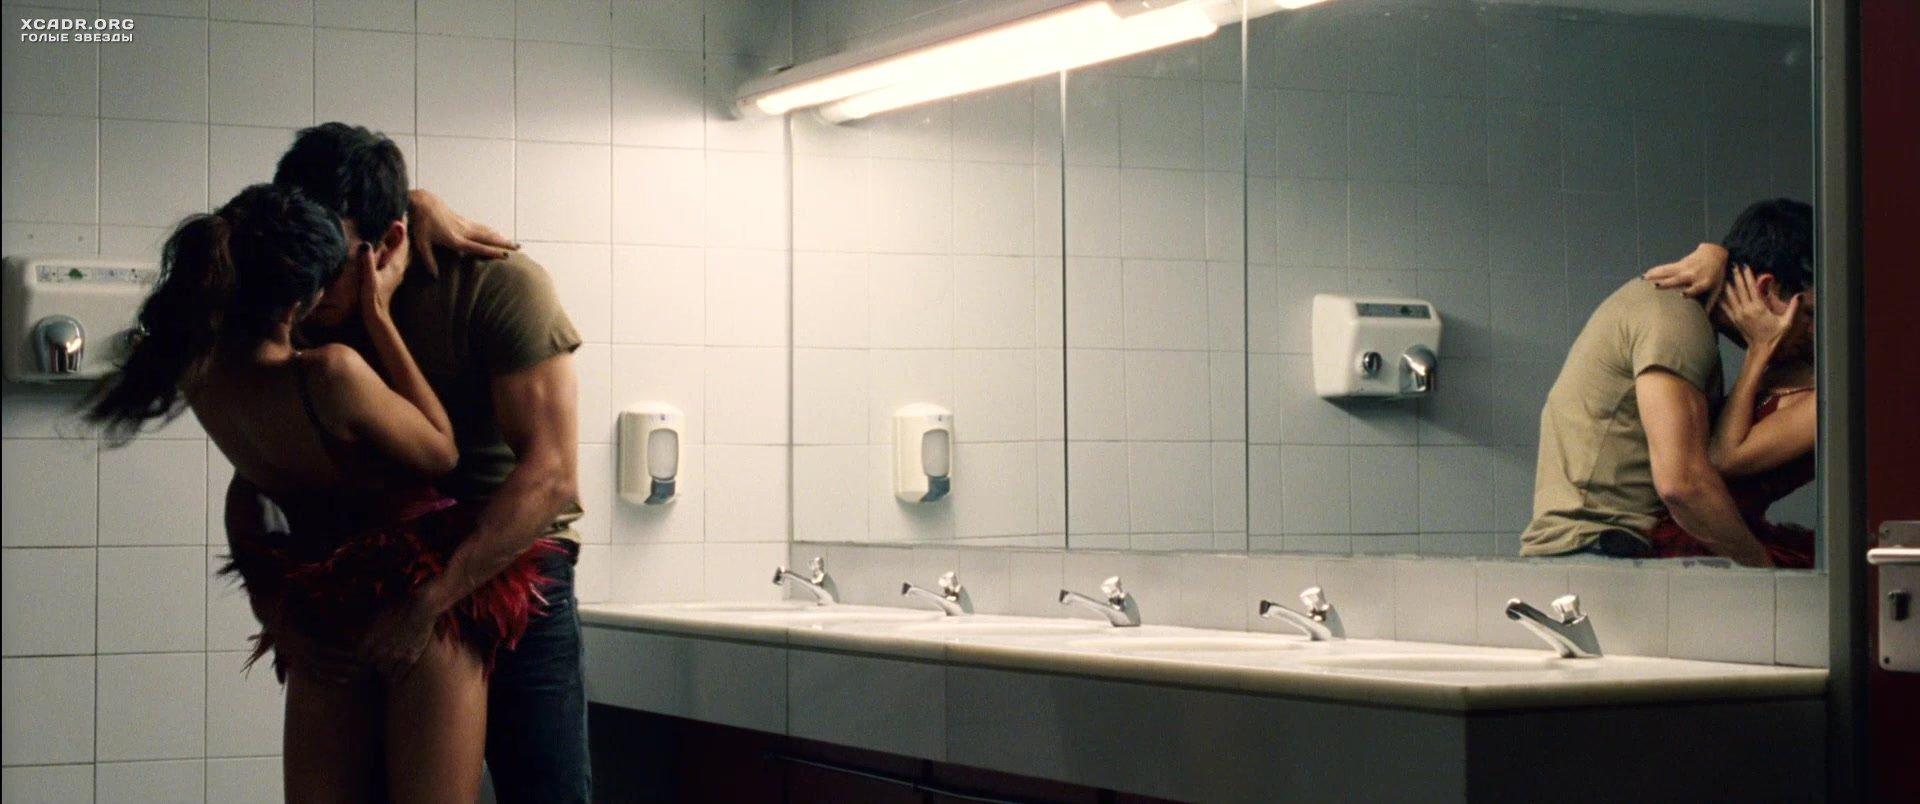 Елена Беркова(Elena Berkova) » Список порно звезд, каталог порно актрис